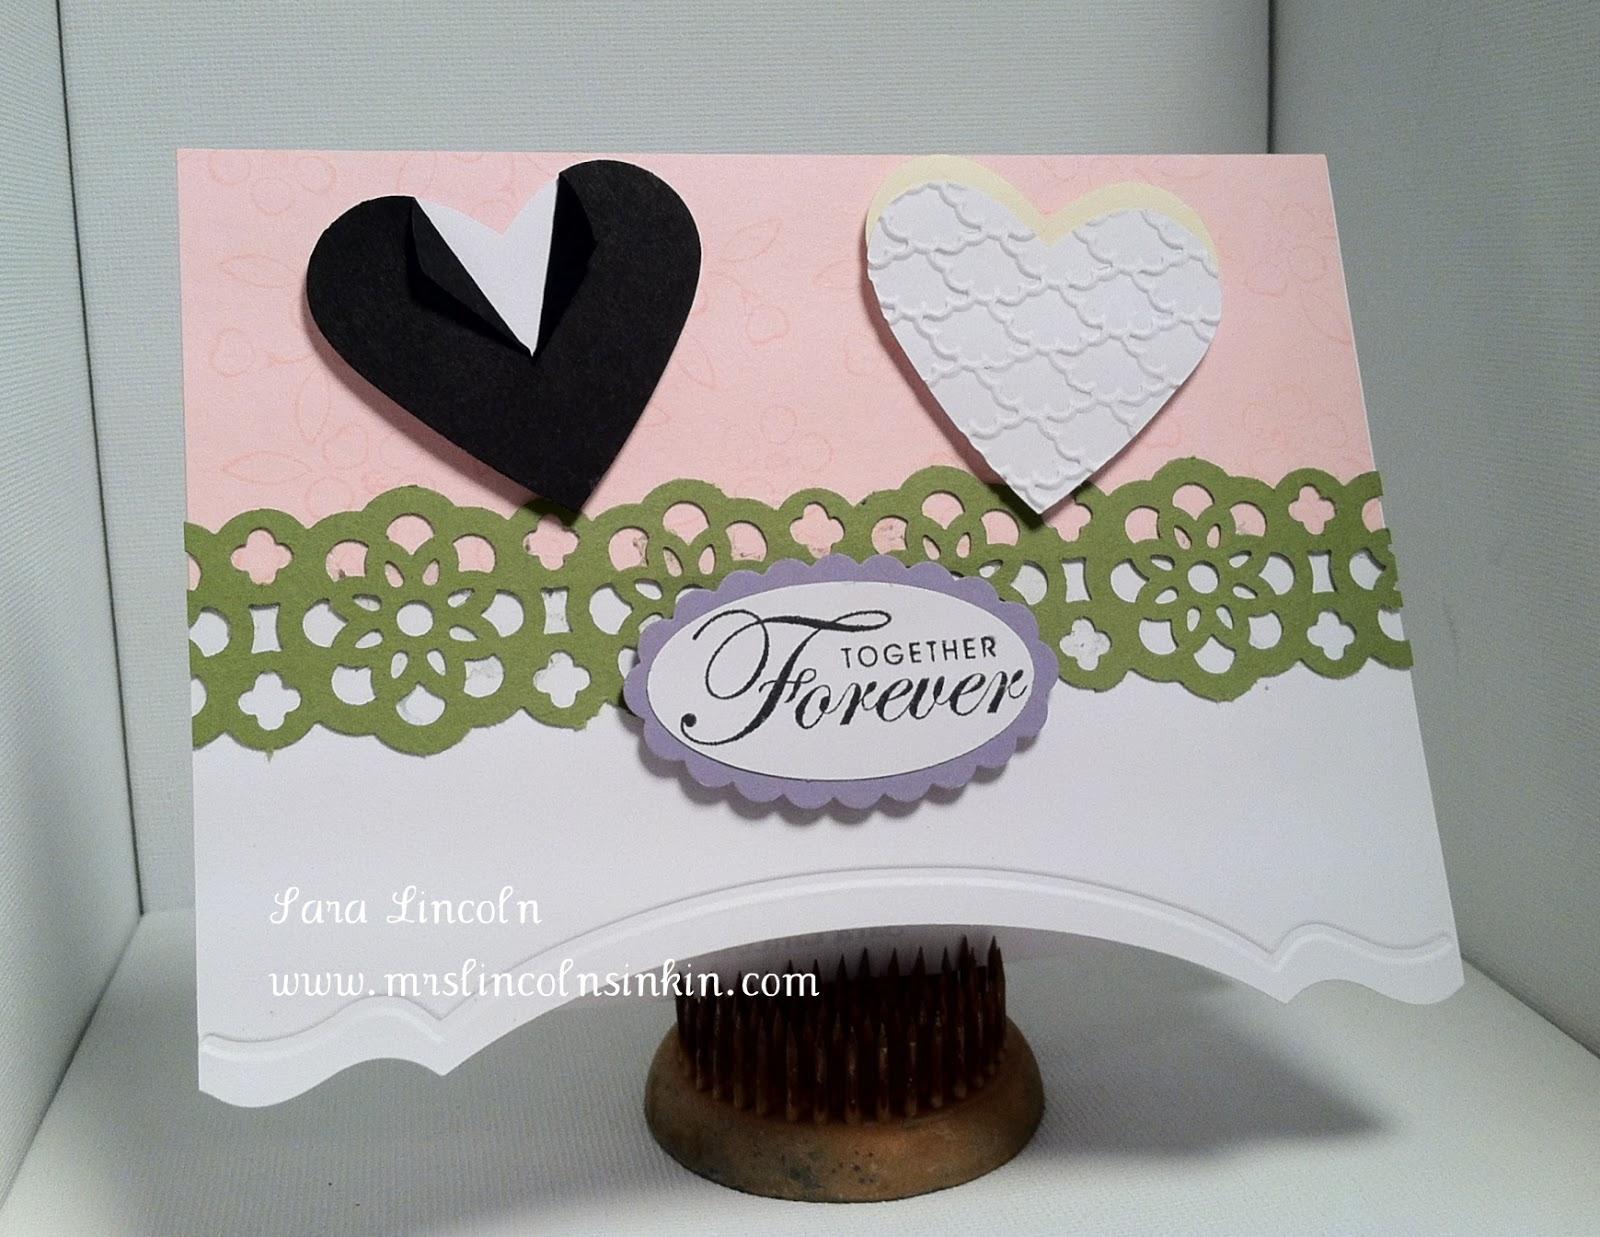 41st Wedding Anniversary Gift: Mrs. Lincoln's Inkin: May 2013